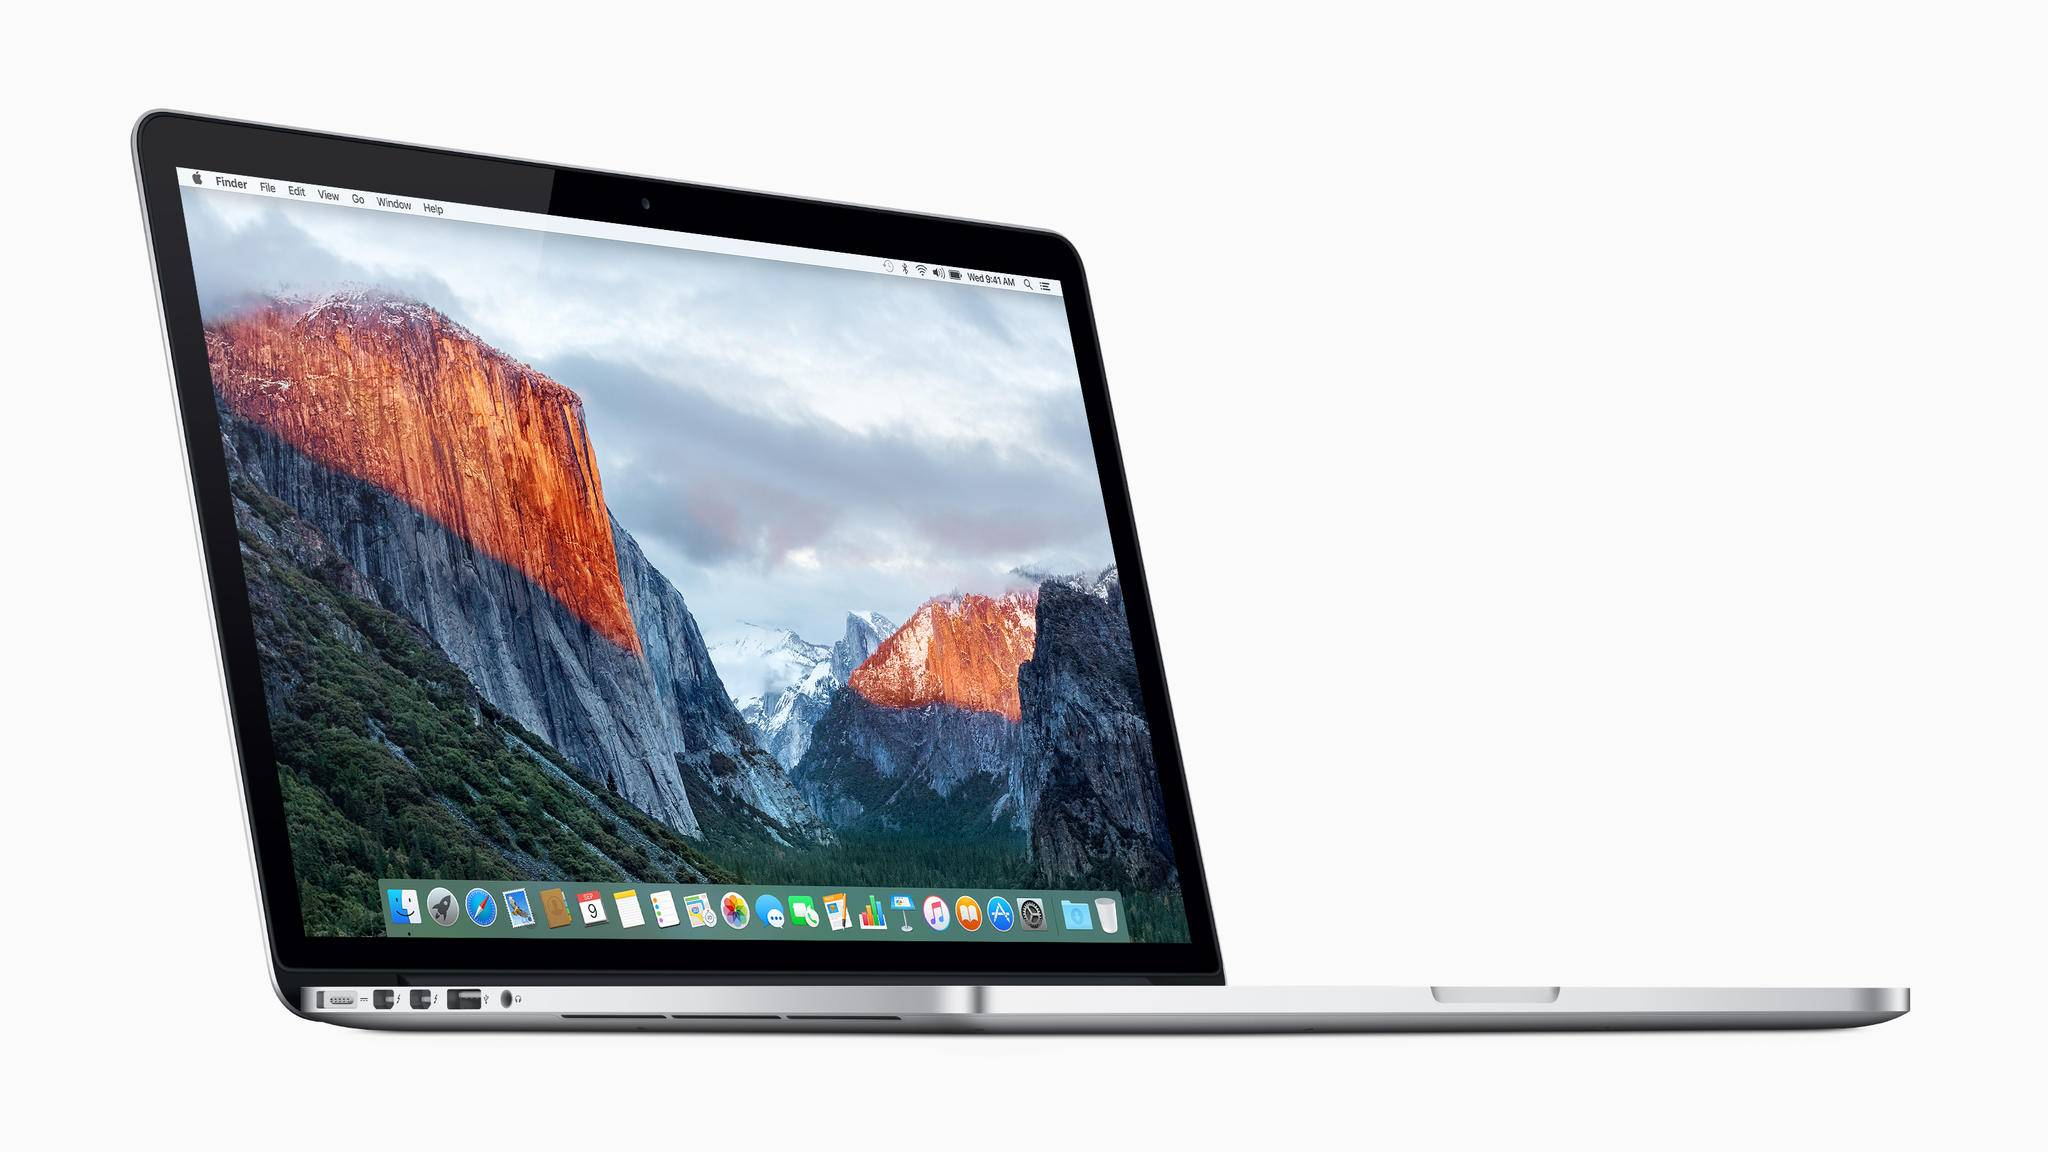 16-Zoll-MacBook-Pro soll mit 96-Watt-USB-C-Netzteil kommen